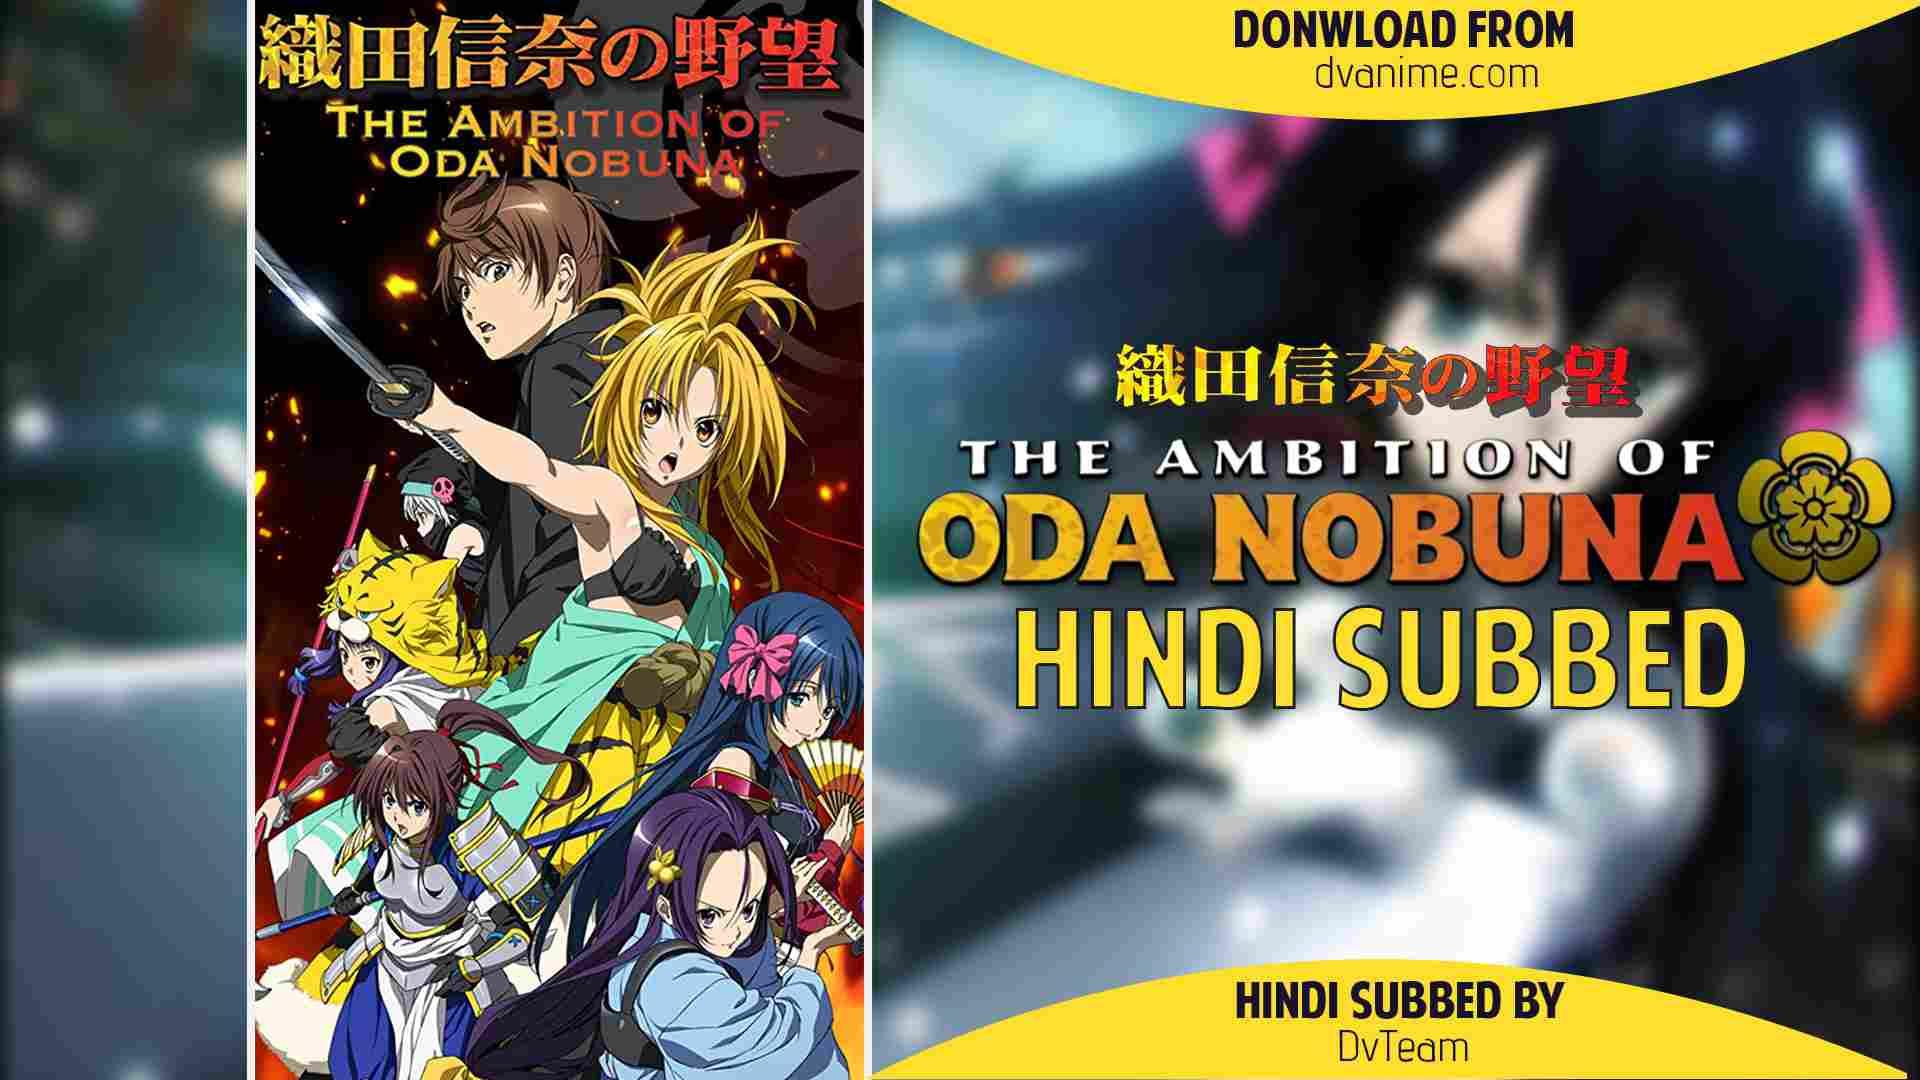 The Ambition of Oda Nobuna Hindi Sub